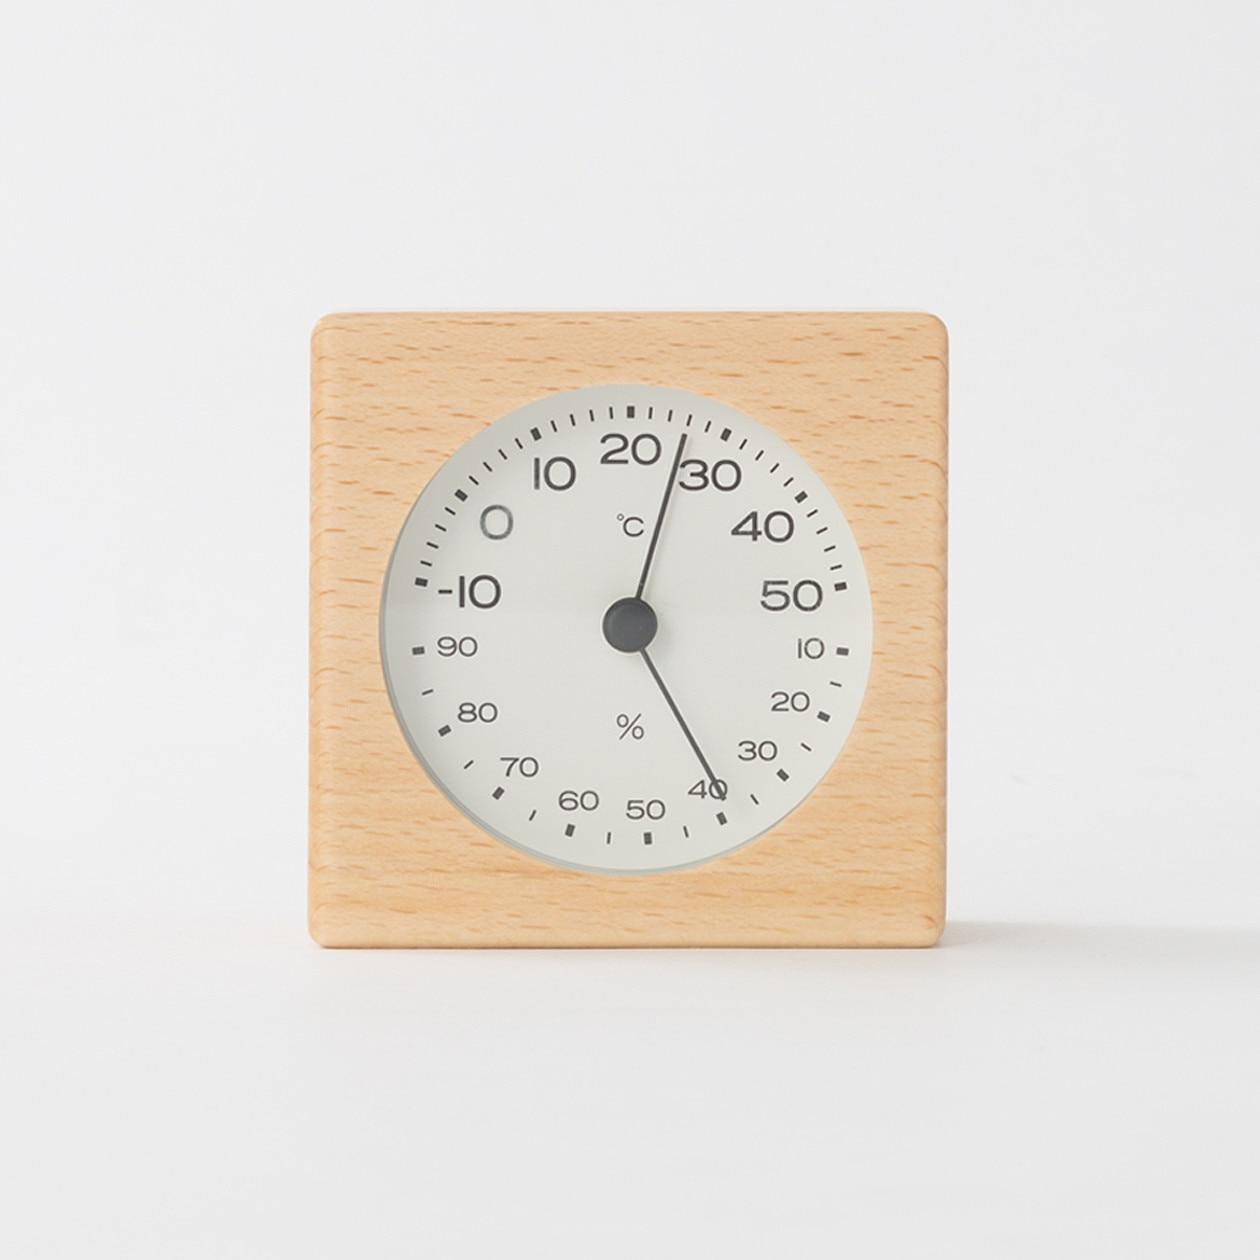 RoomClip商品情報 - ブナ材温湿度計